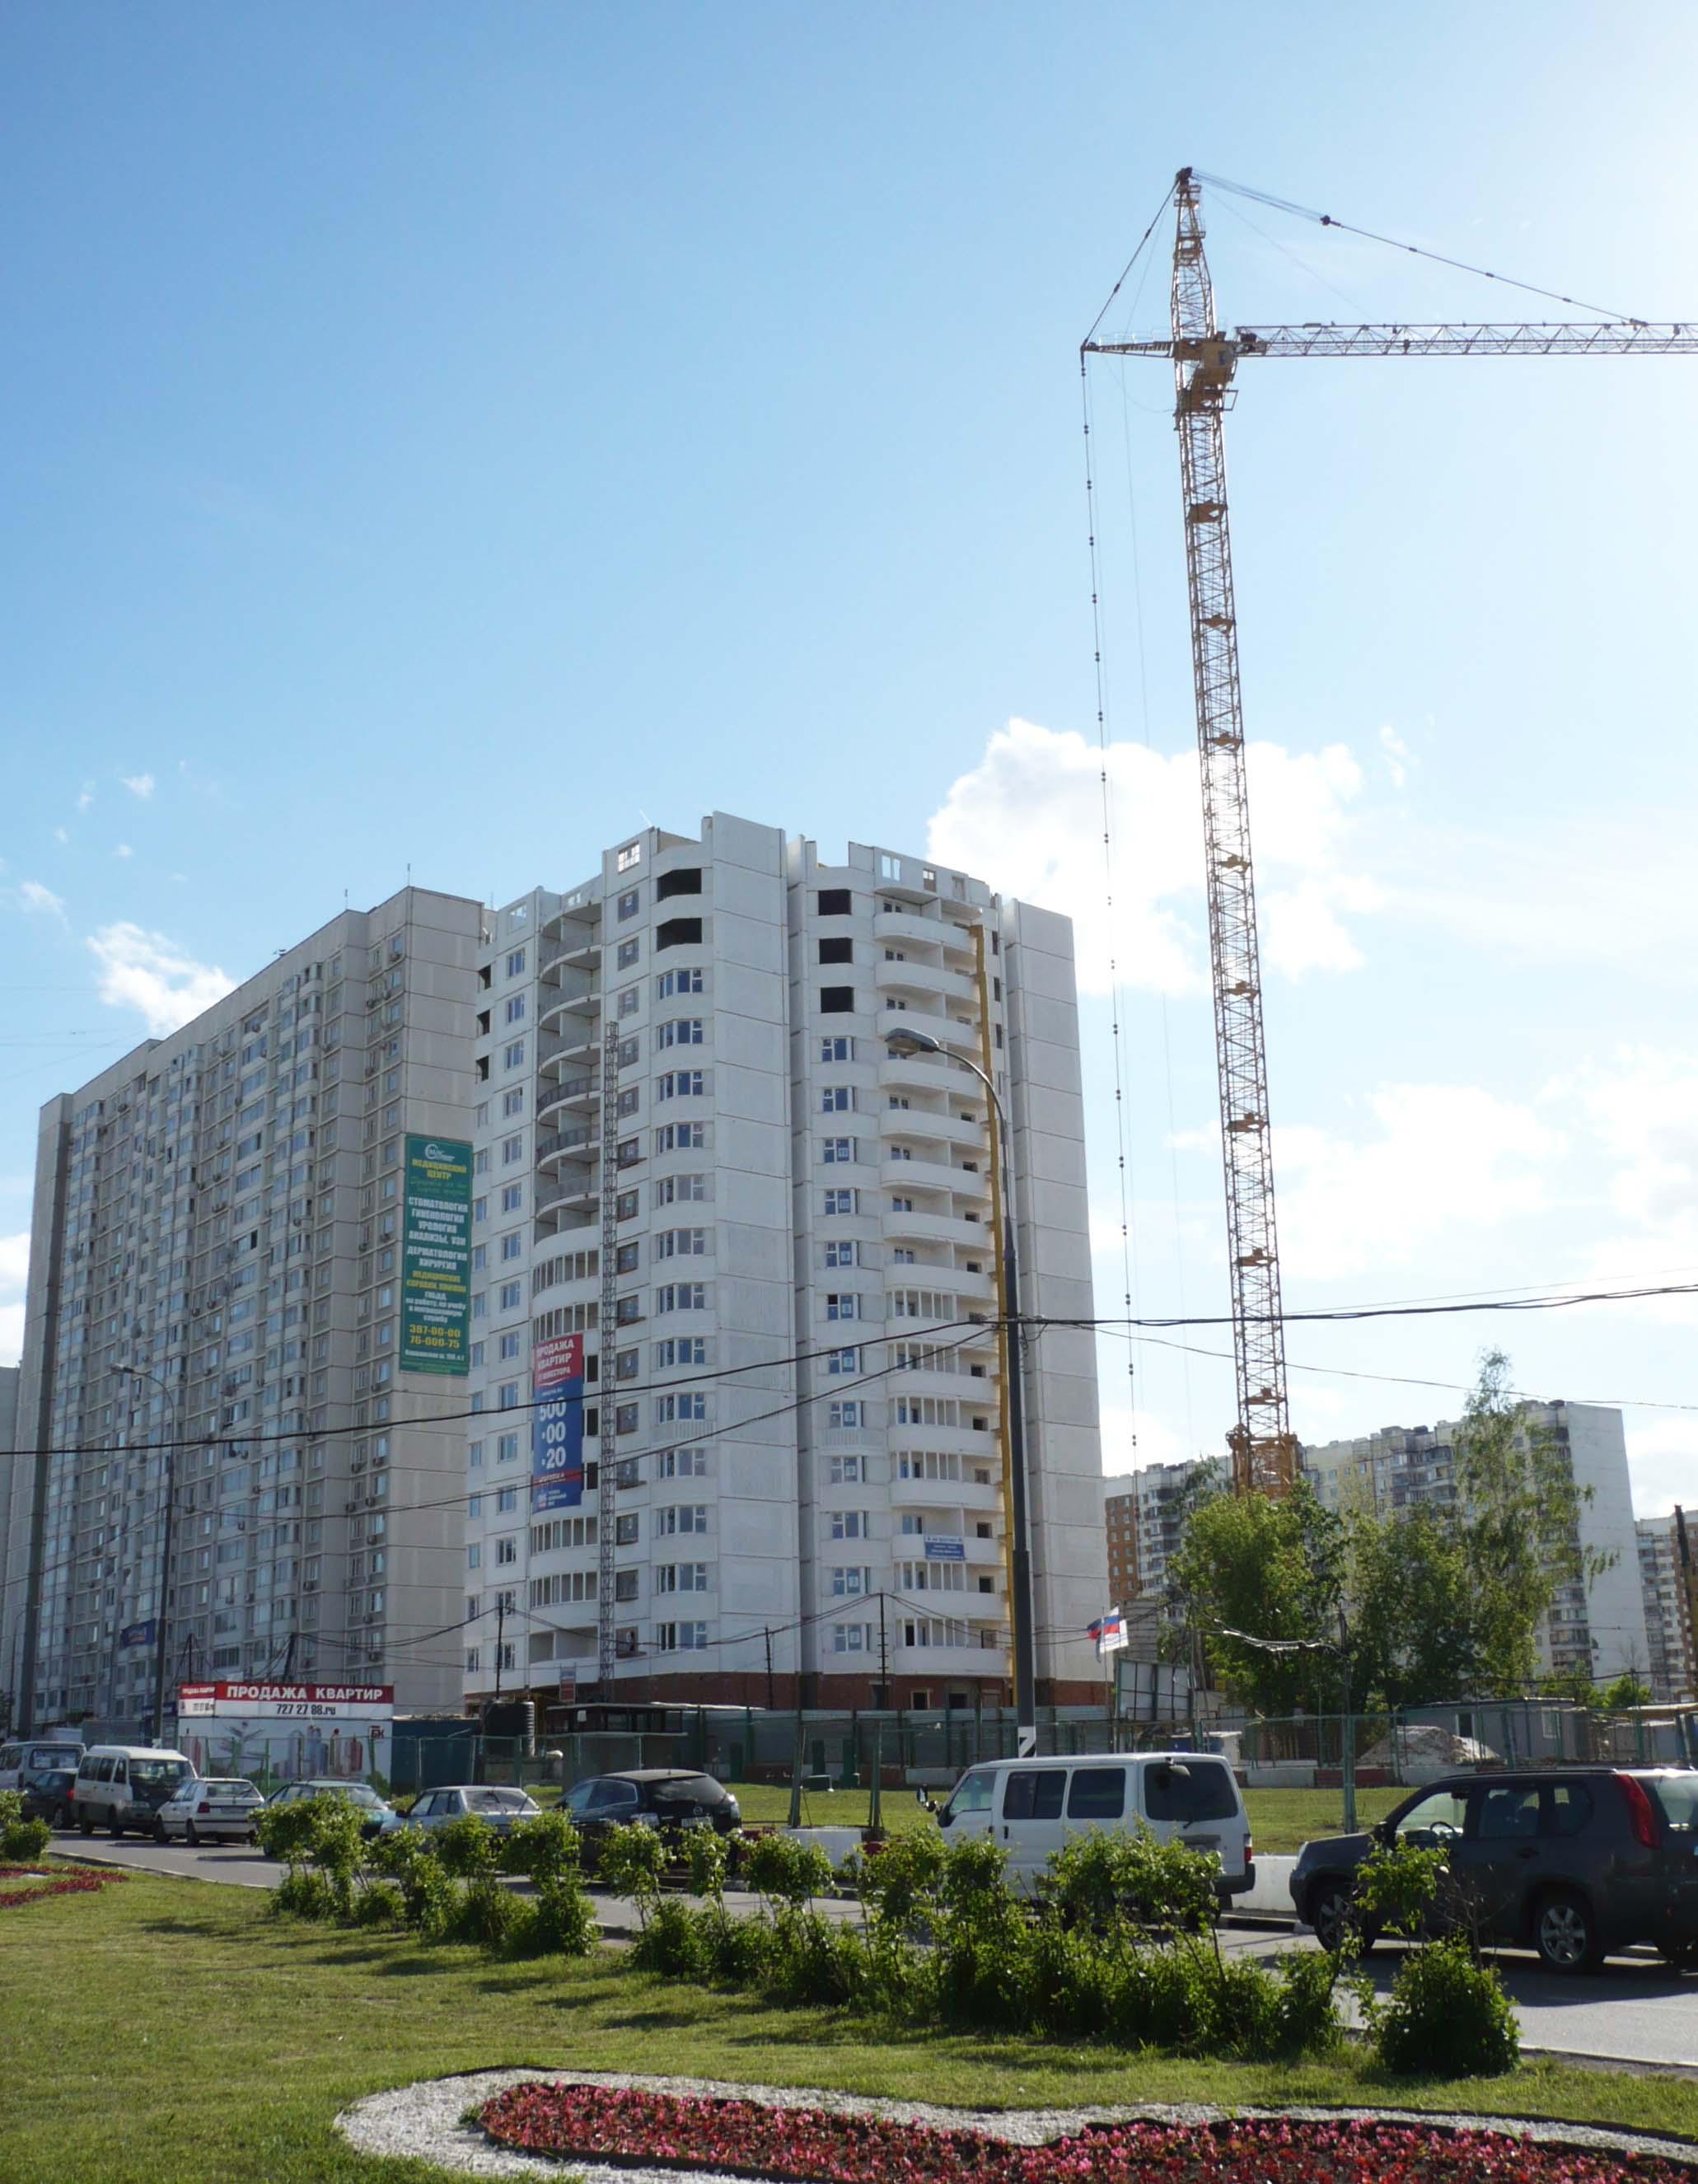 http://img-fotki.yandex.ru/get/5806/semen-varfolomeev.8/0_5d569_1363b86d_orig